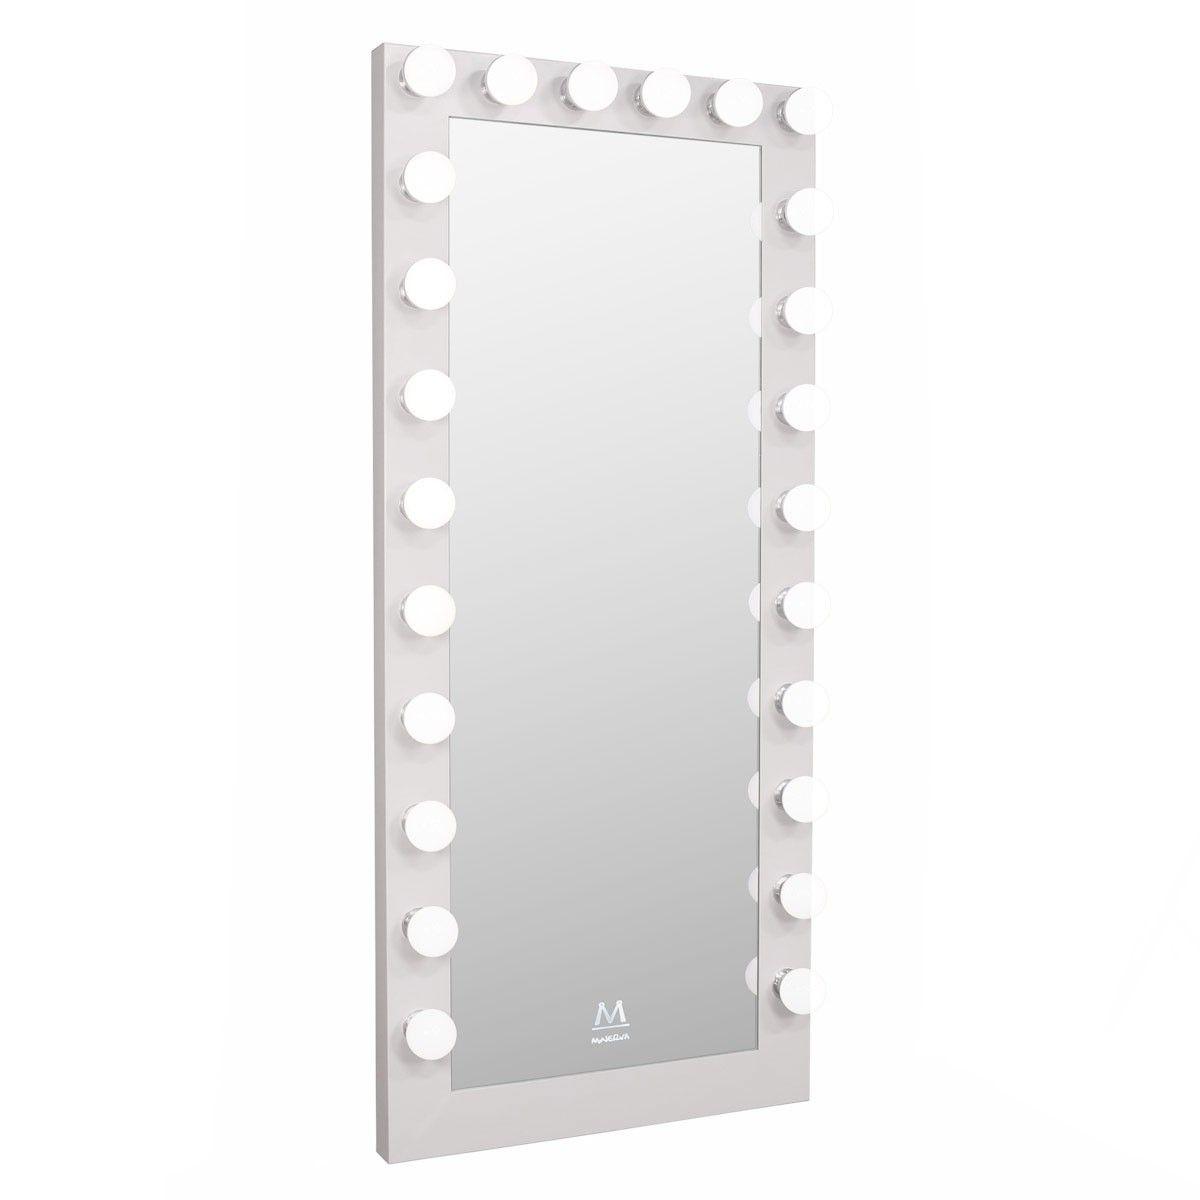 Paramount Full Length Hollywood Makeup Led Vanity Mirror In White Vanity Mirror Led Vanity Vanity